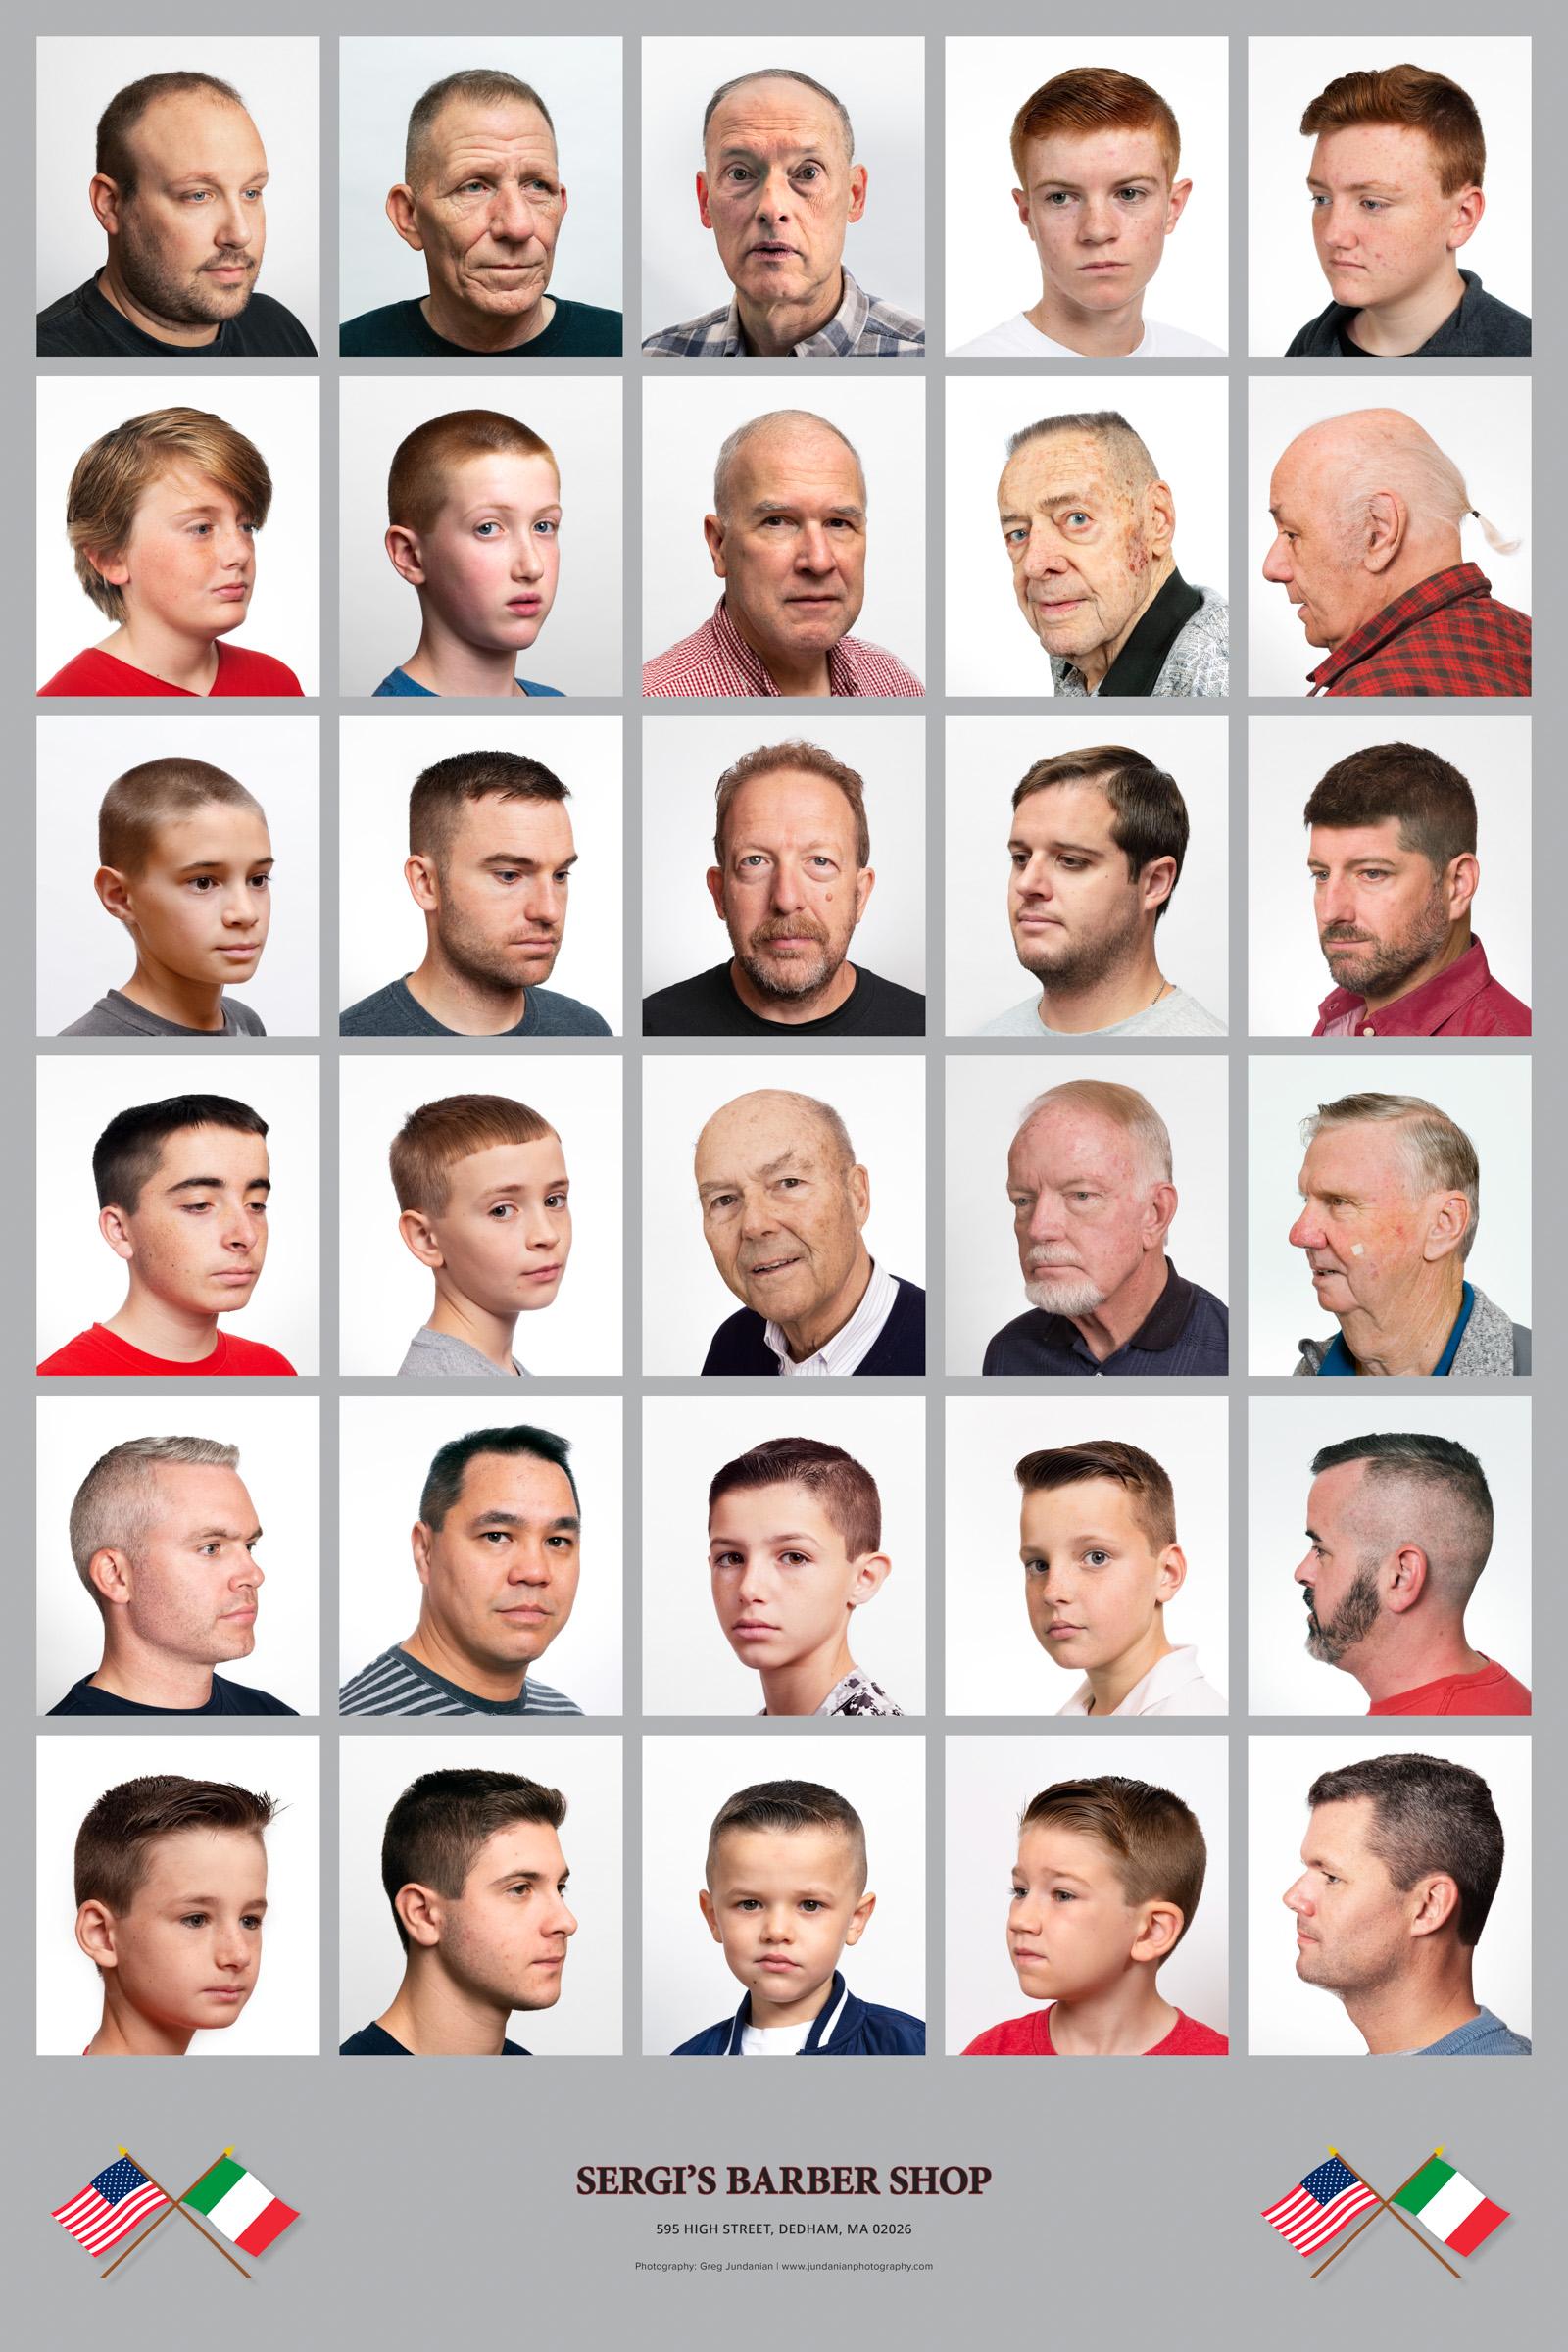 Sergi's Barbershop, Dedham, MA